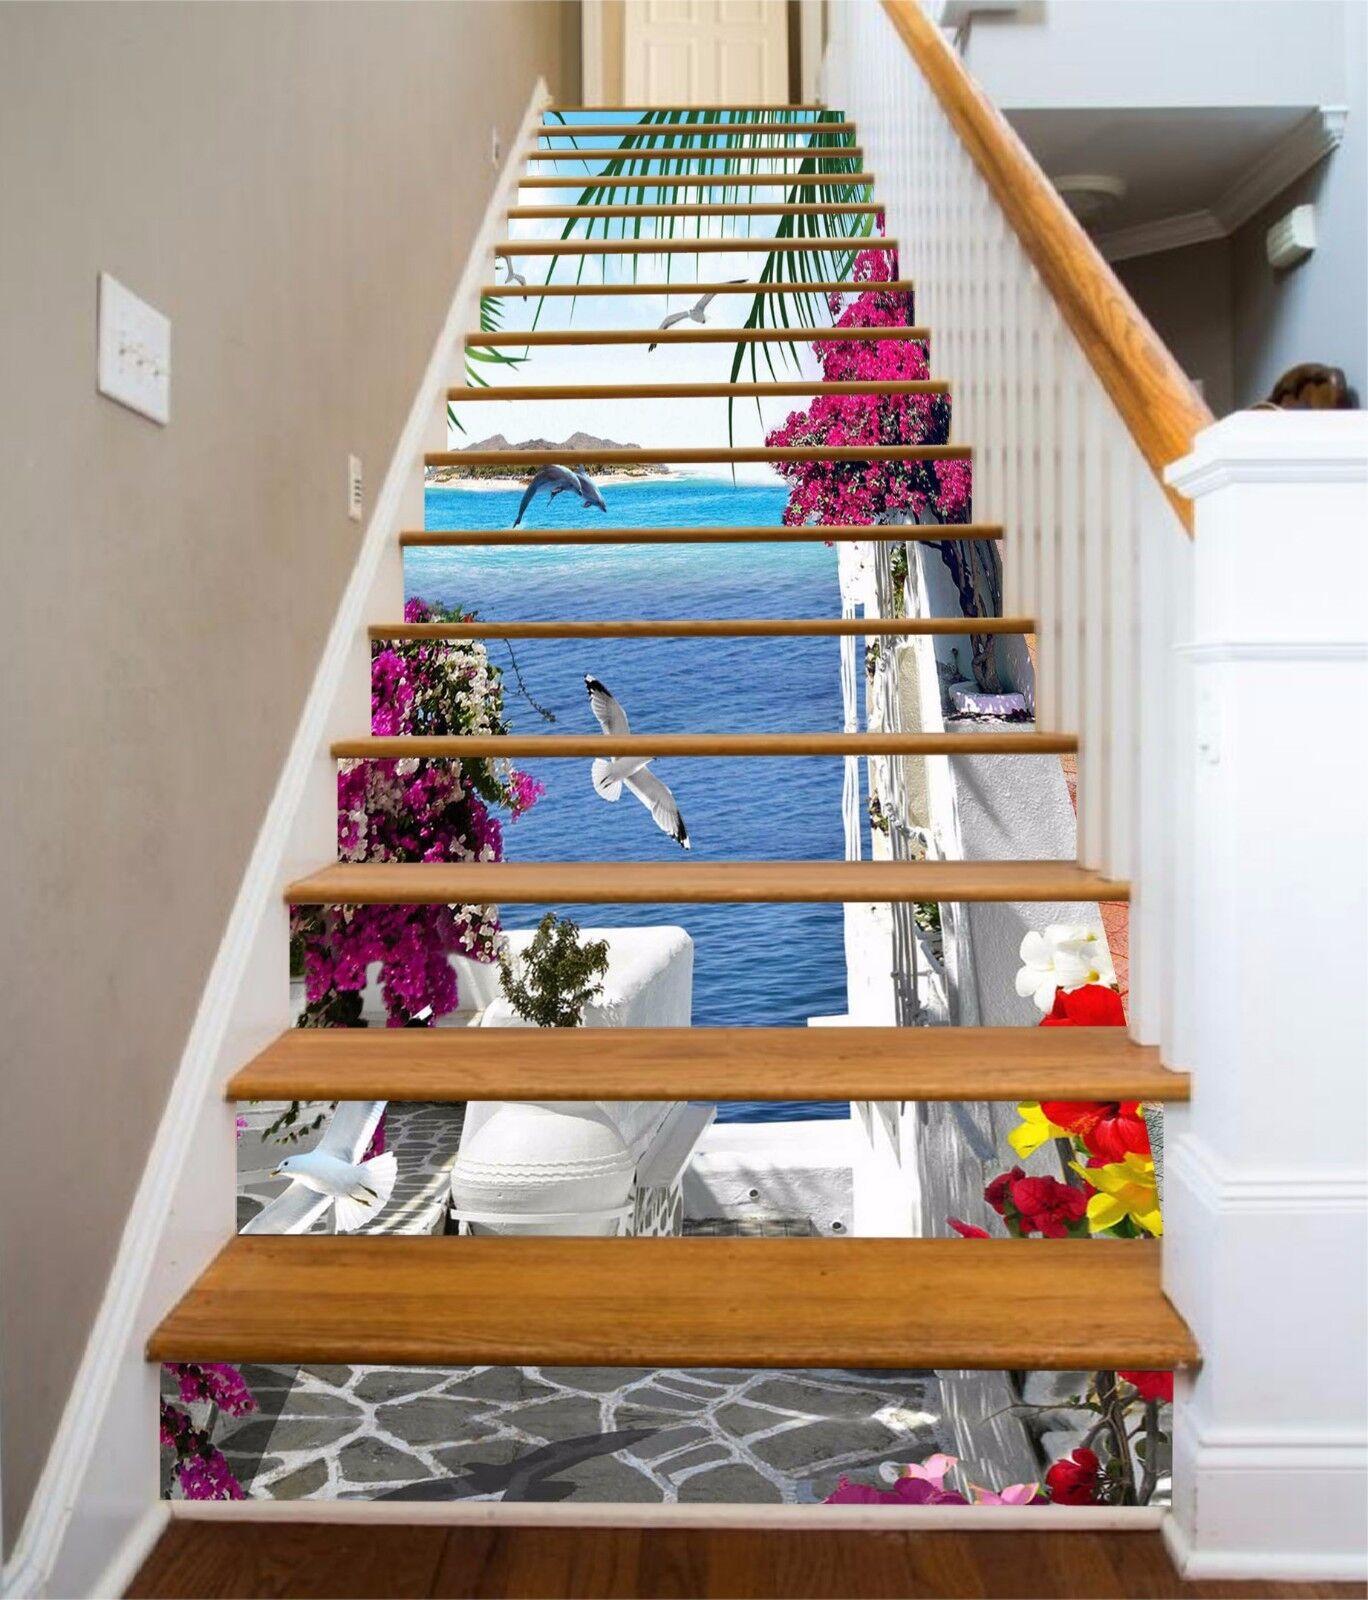 3D Seaside garden Stair Risers Decoration Photo Mural Vinyl Decal Wallpaper AU